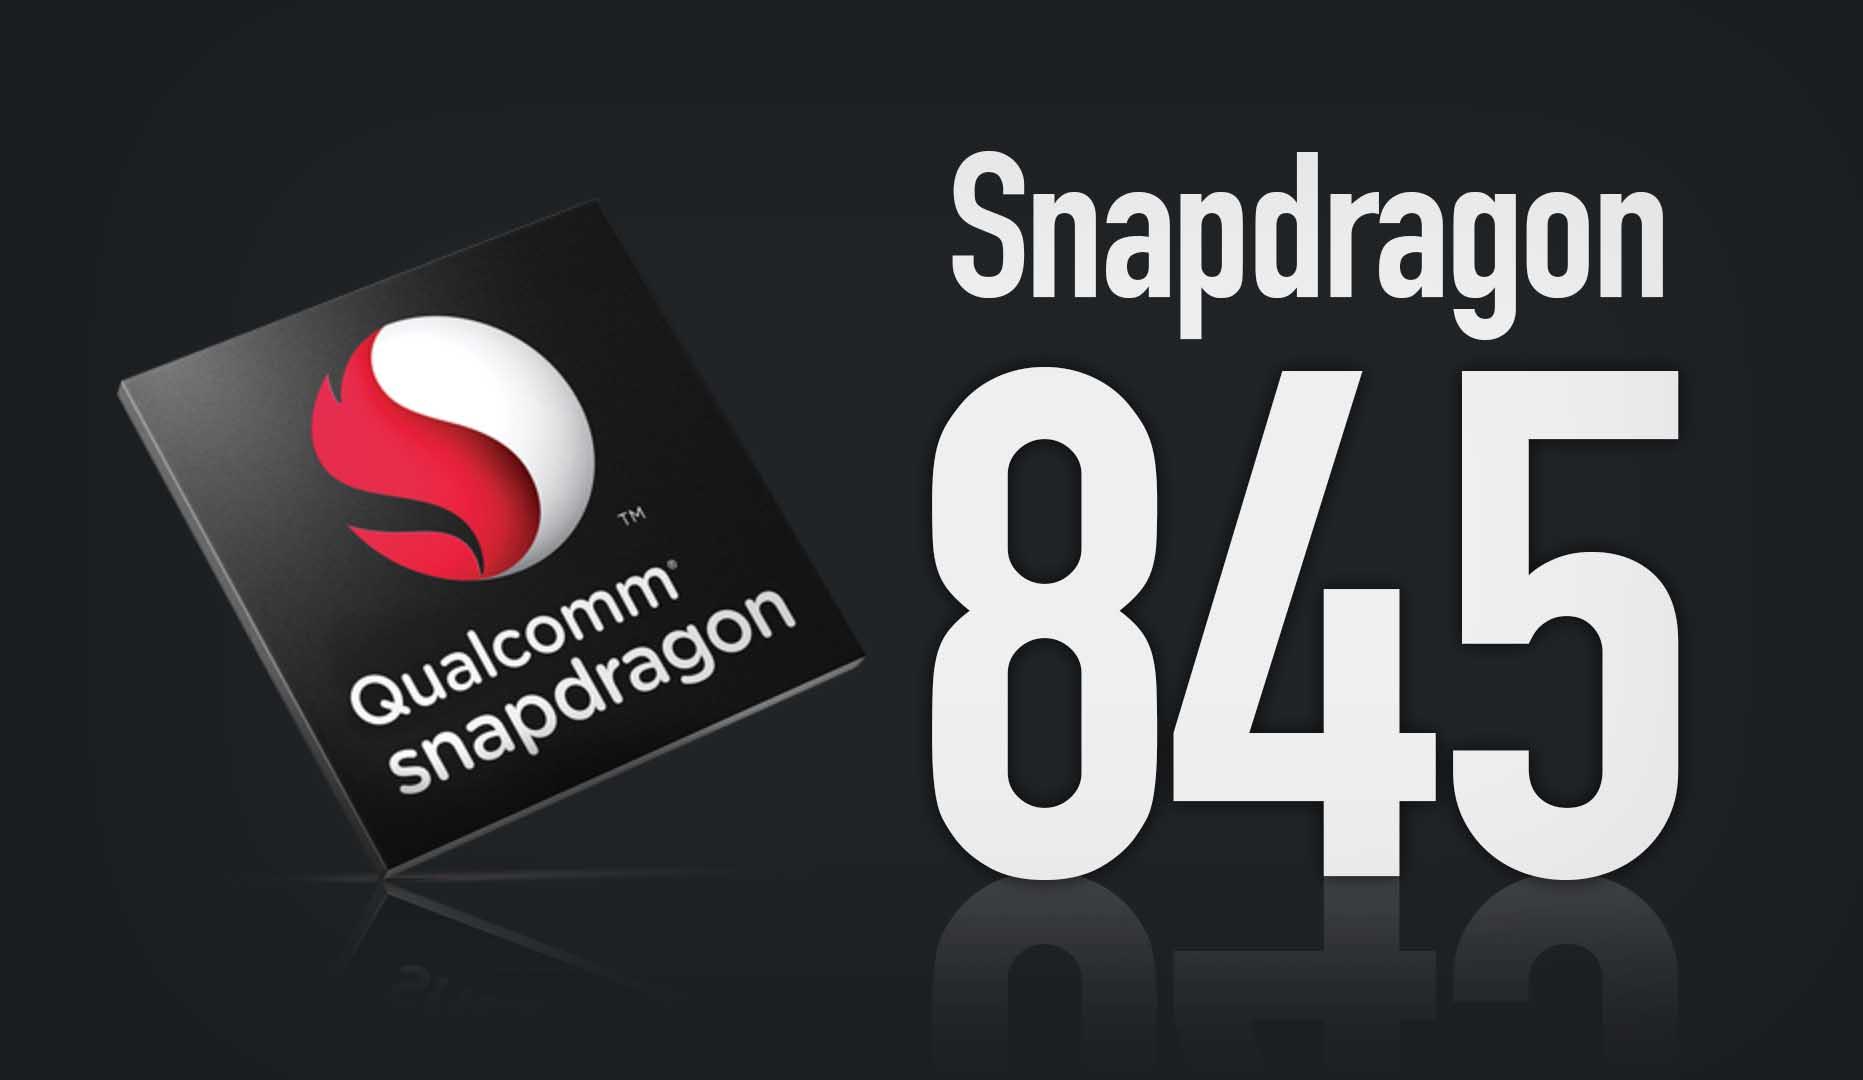 Qualcomm Snapdragon 845 представлен официально